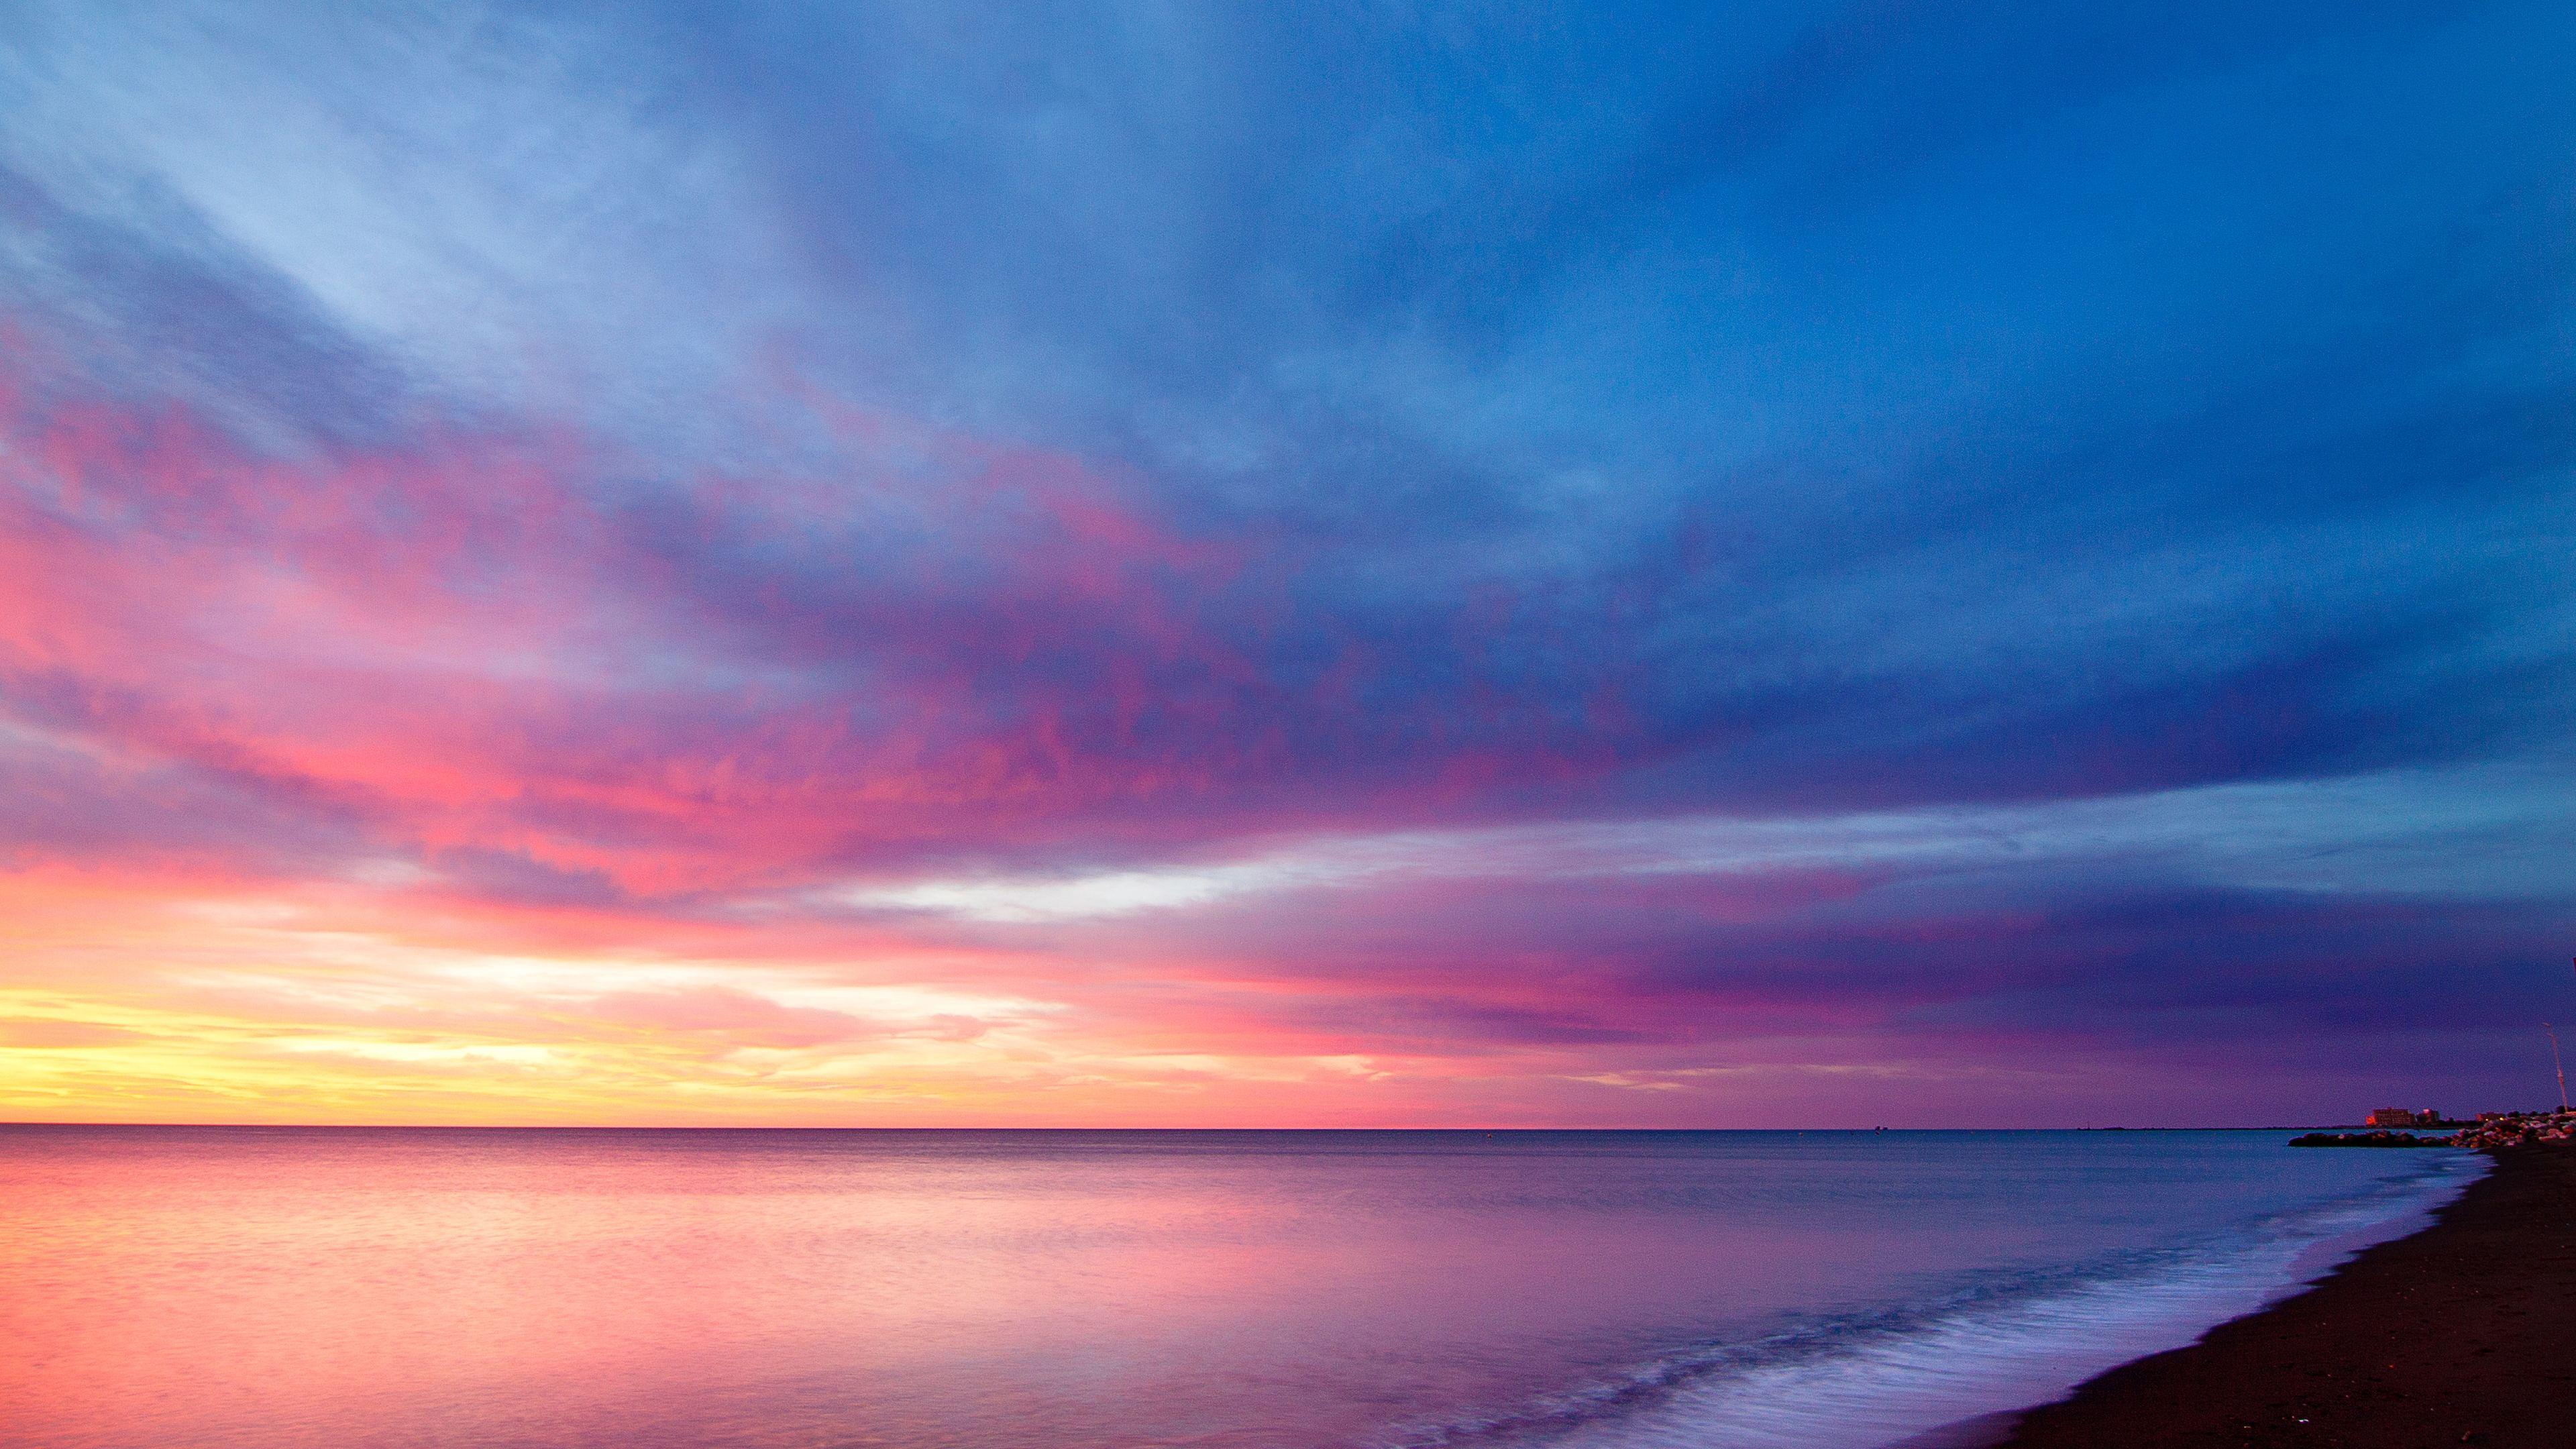 sea line purple sky 4k 1551643628 - Sea Line Purple Sky 4k - sky wallpapers, sea wallpapers, purple wallpapers, nature wallpapers, hd-wallpapers, 4k-wallpapers